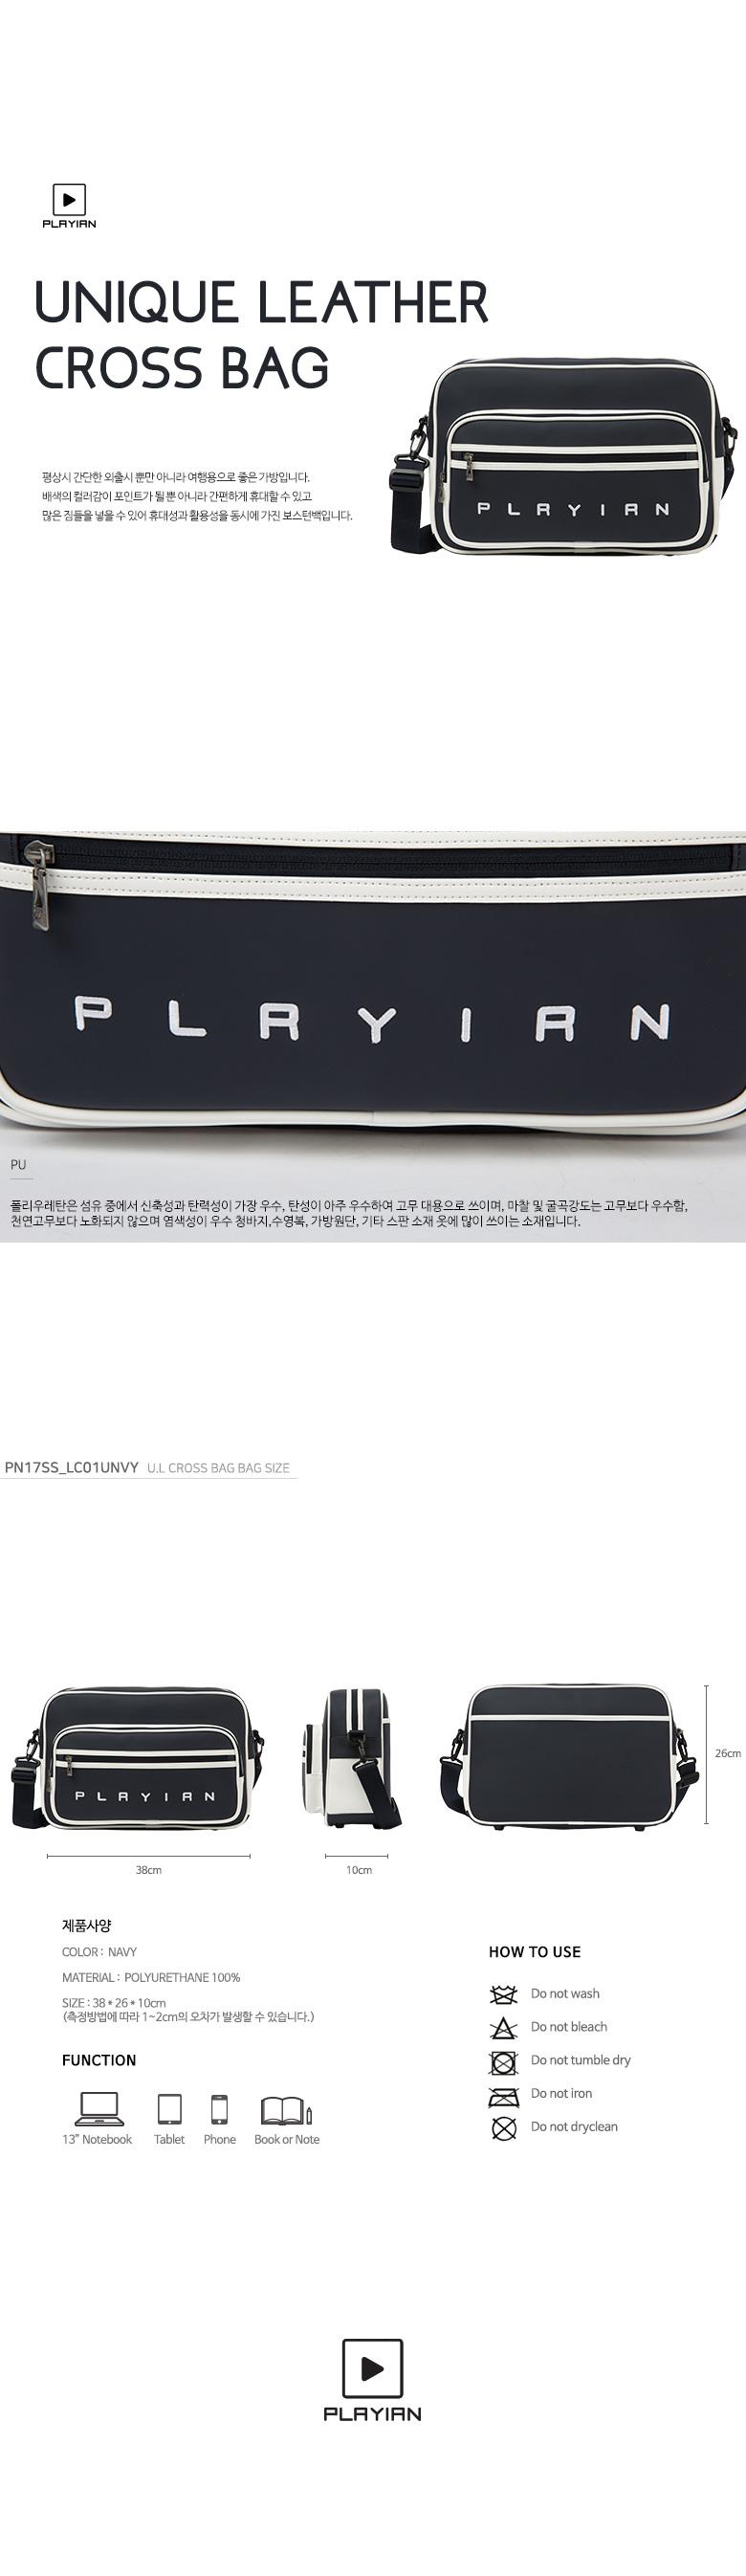 U.L cross bag_유니크 레더 크로스백(LC01UNVY)